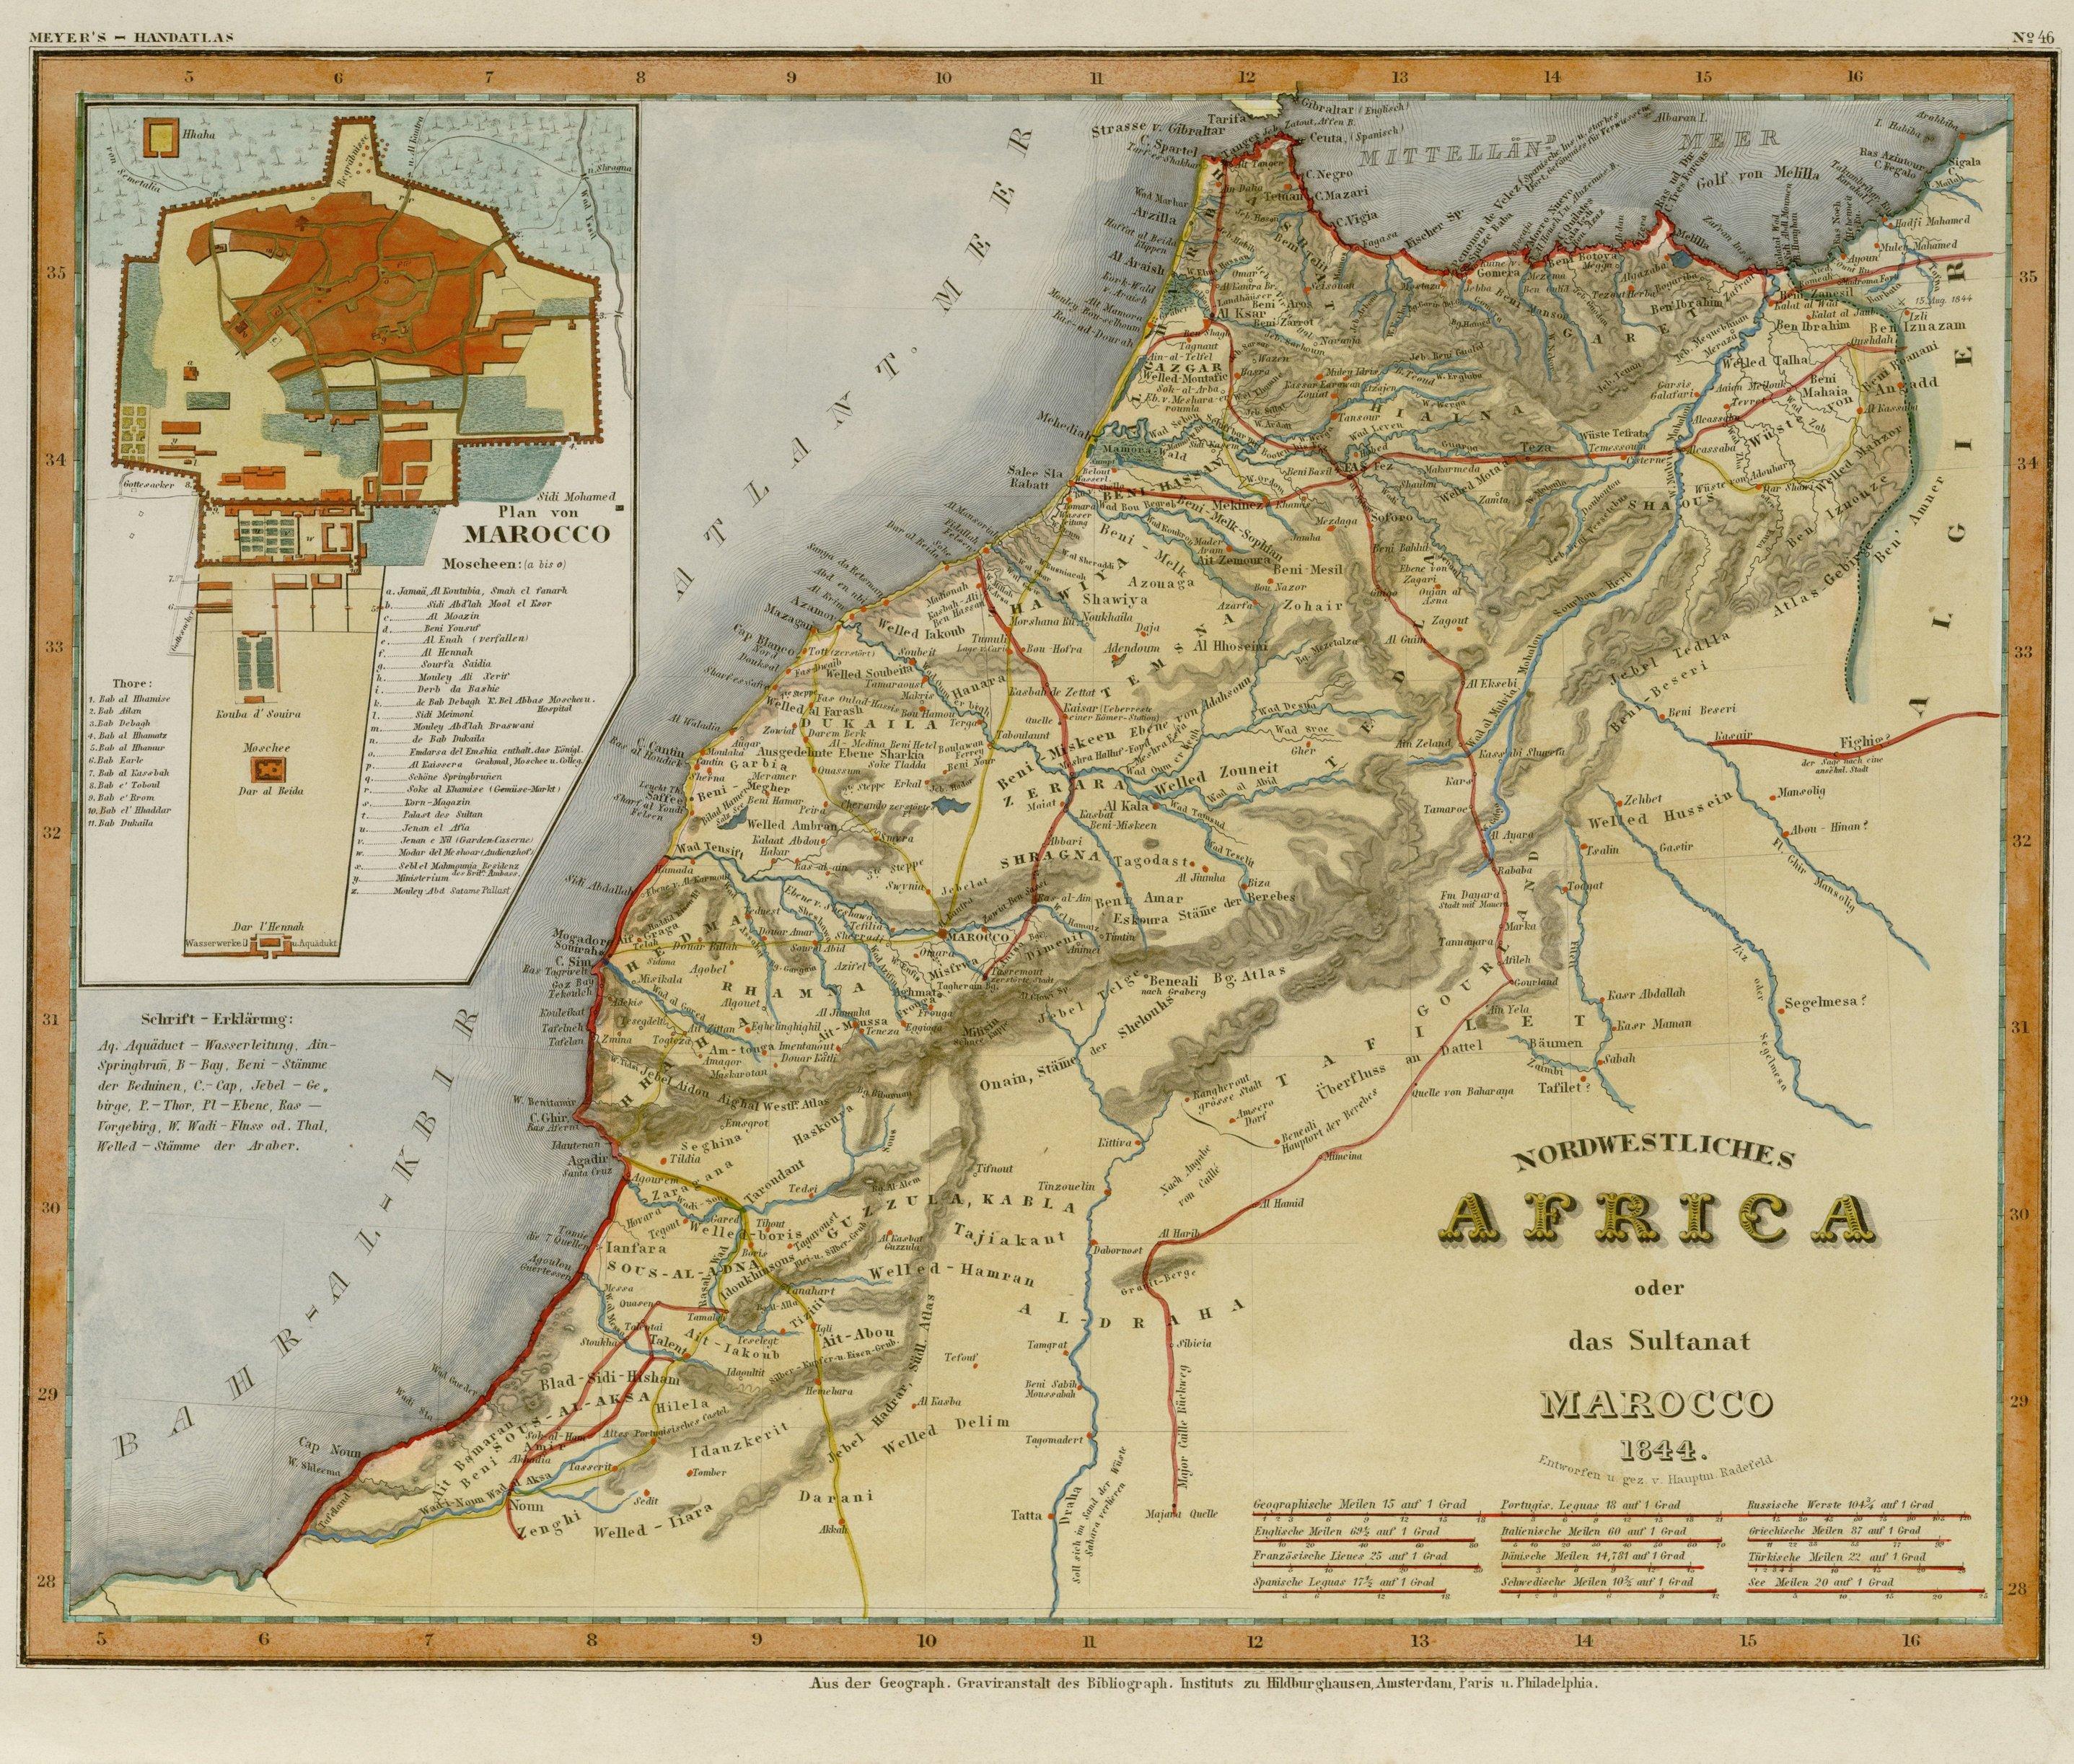 carte Allemande du Maroc